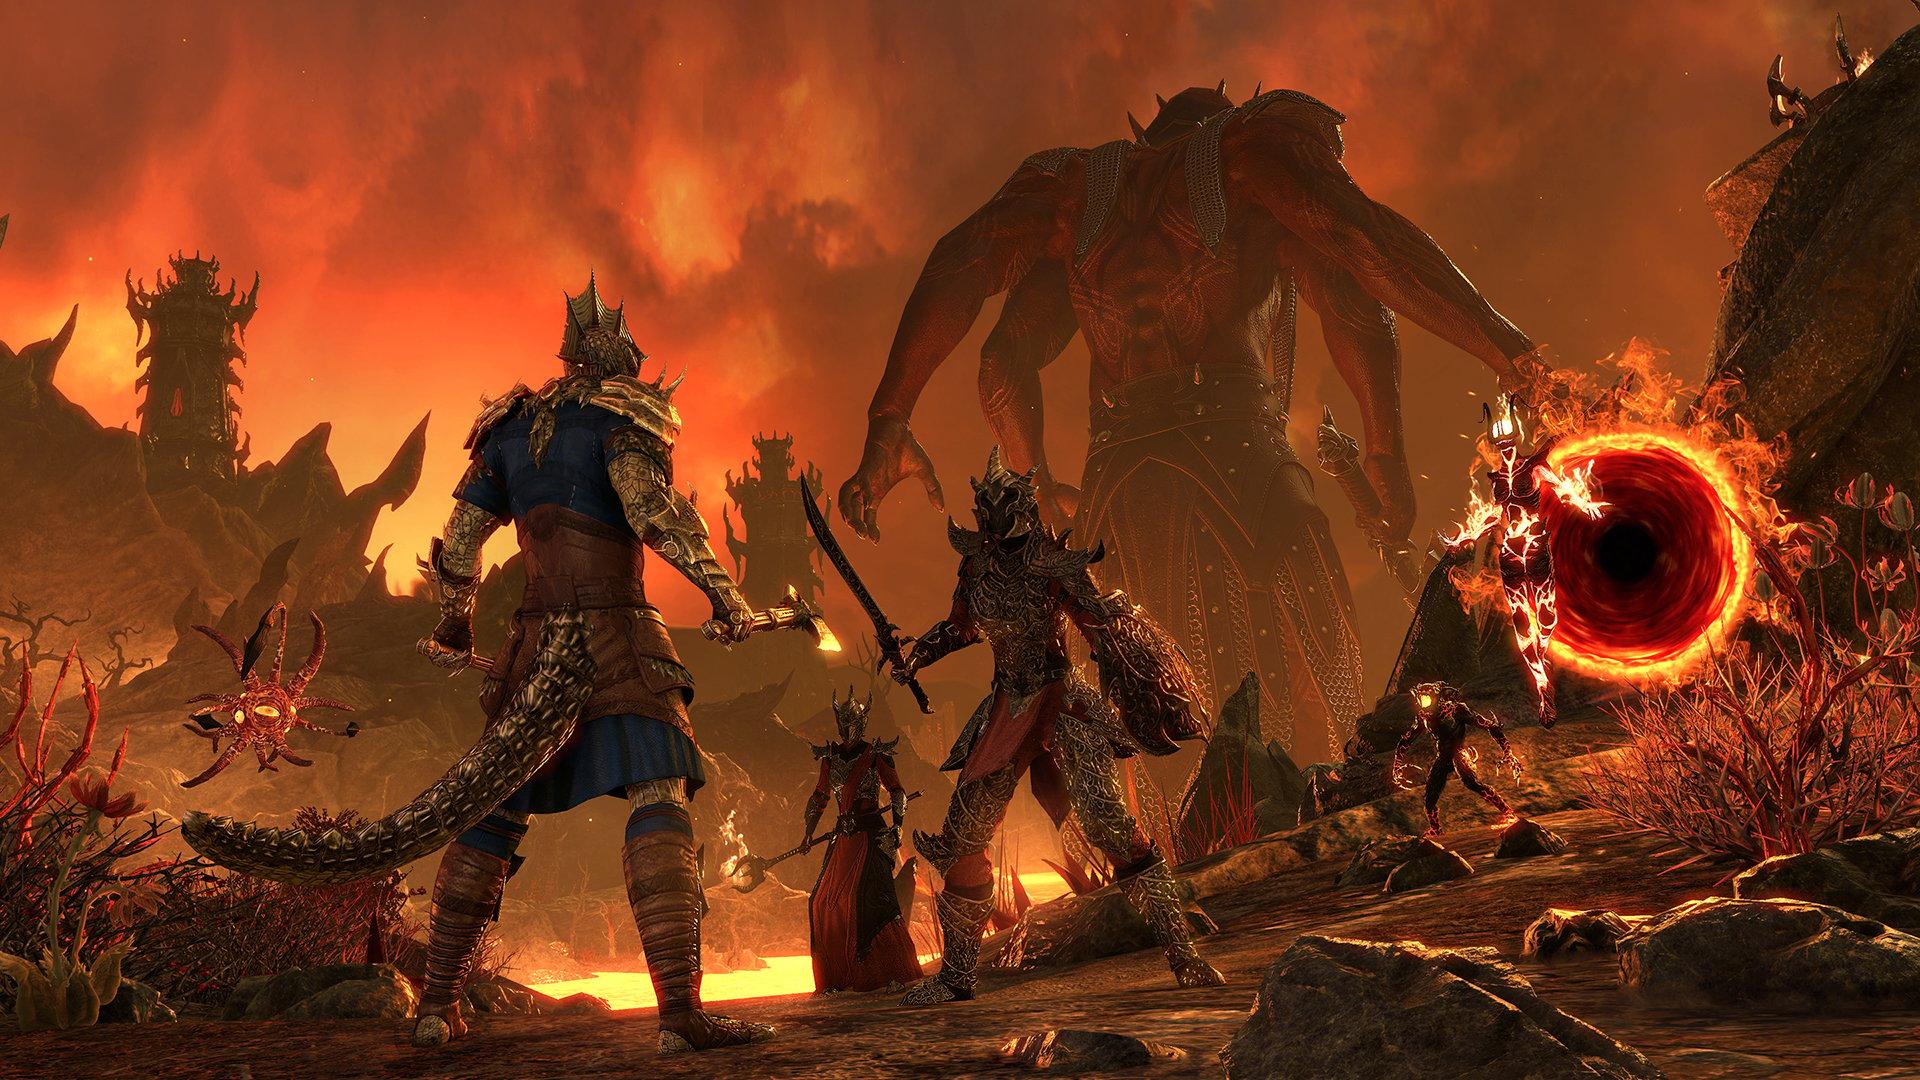 Elder Scrolls Online's Blackwood Chapter Sends Players Straight to Hell - Elder  Scrolls Online's Audio Director on Sending Gamers Straight to Hell (Or  Oblivion, At Least) SPIN